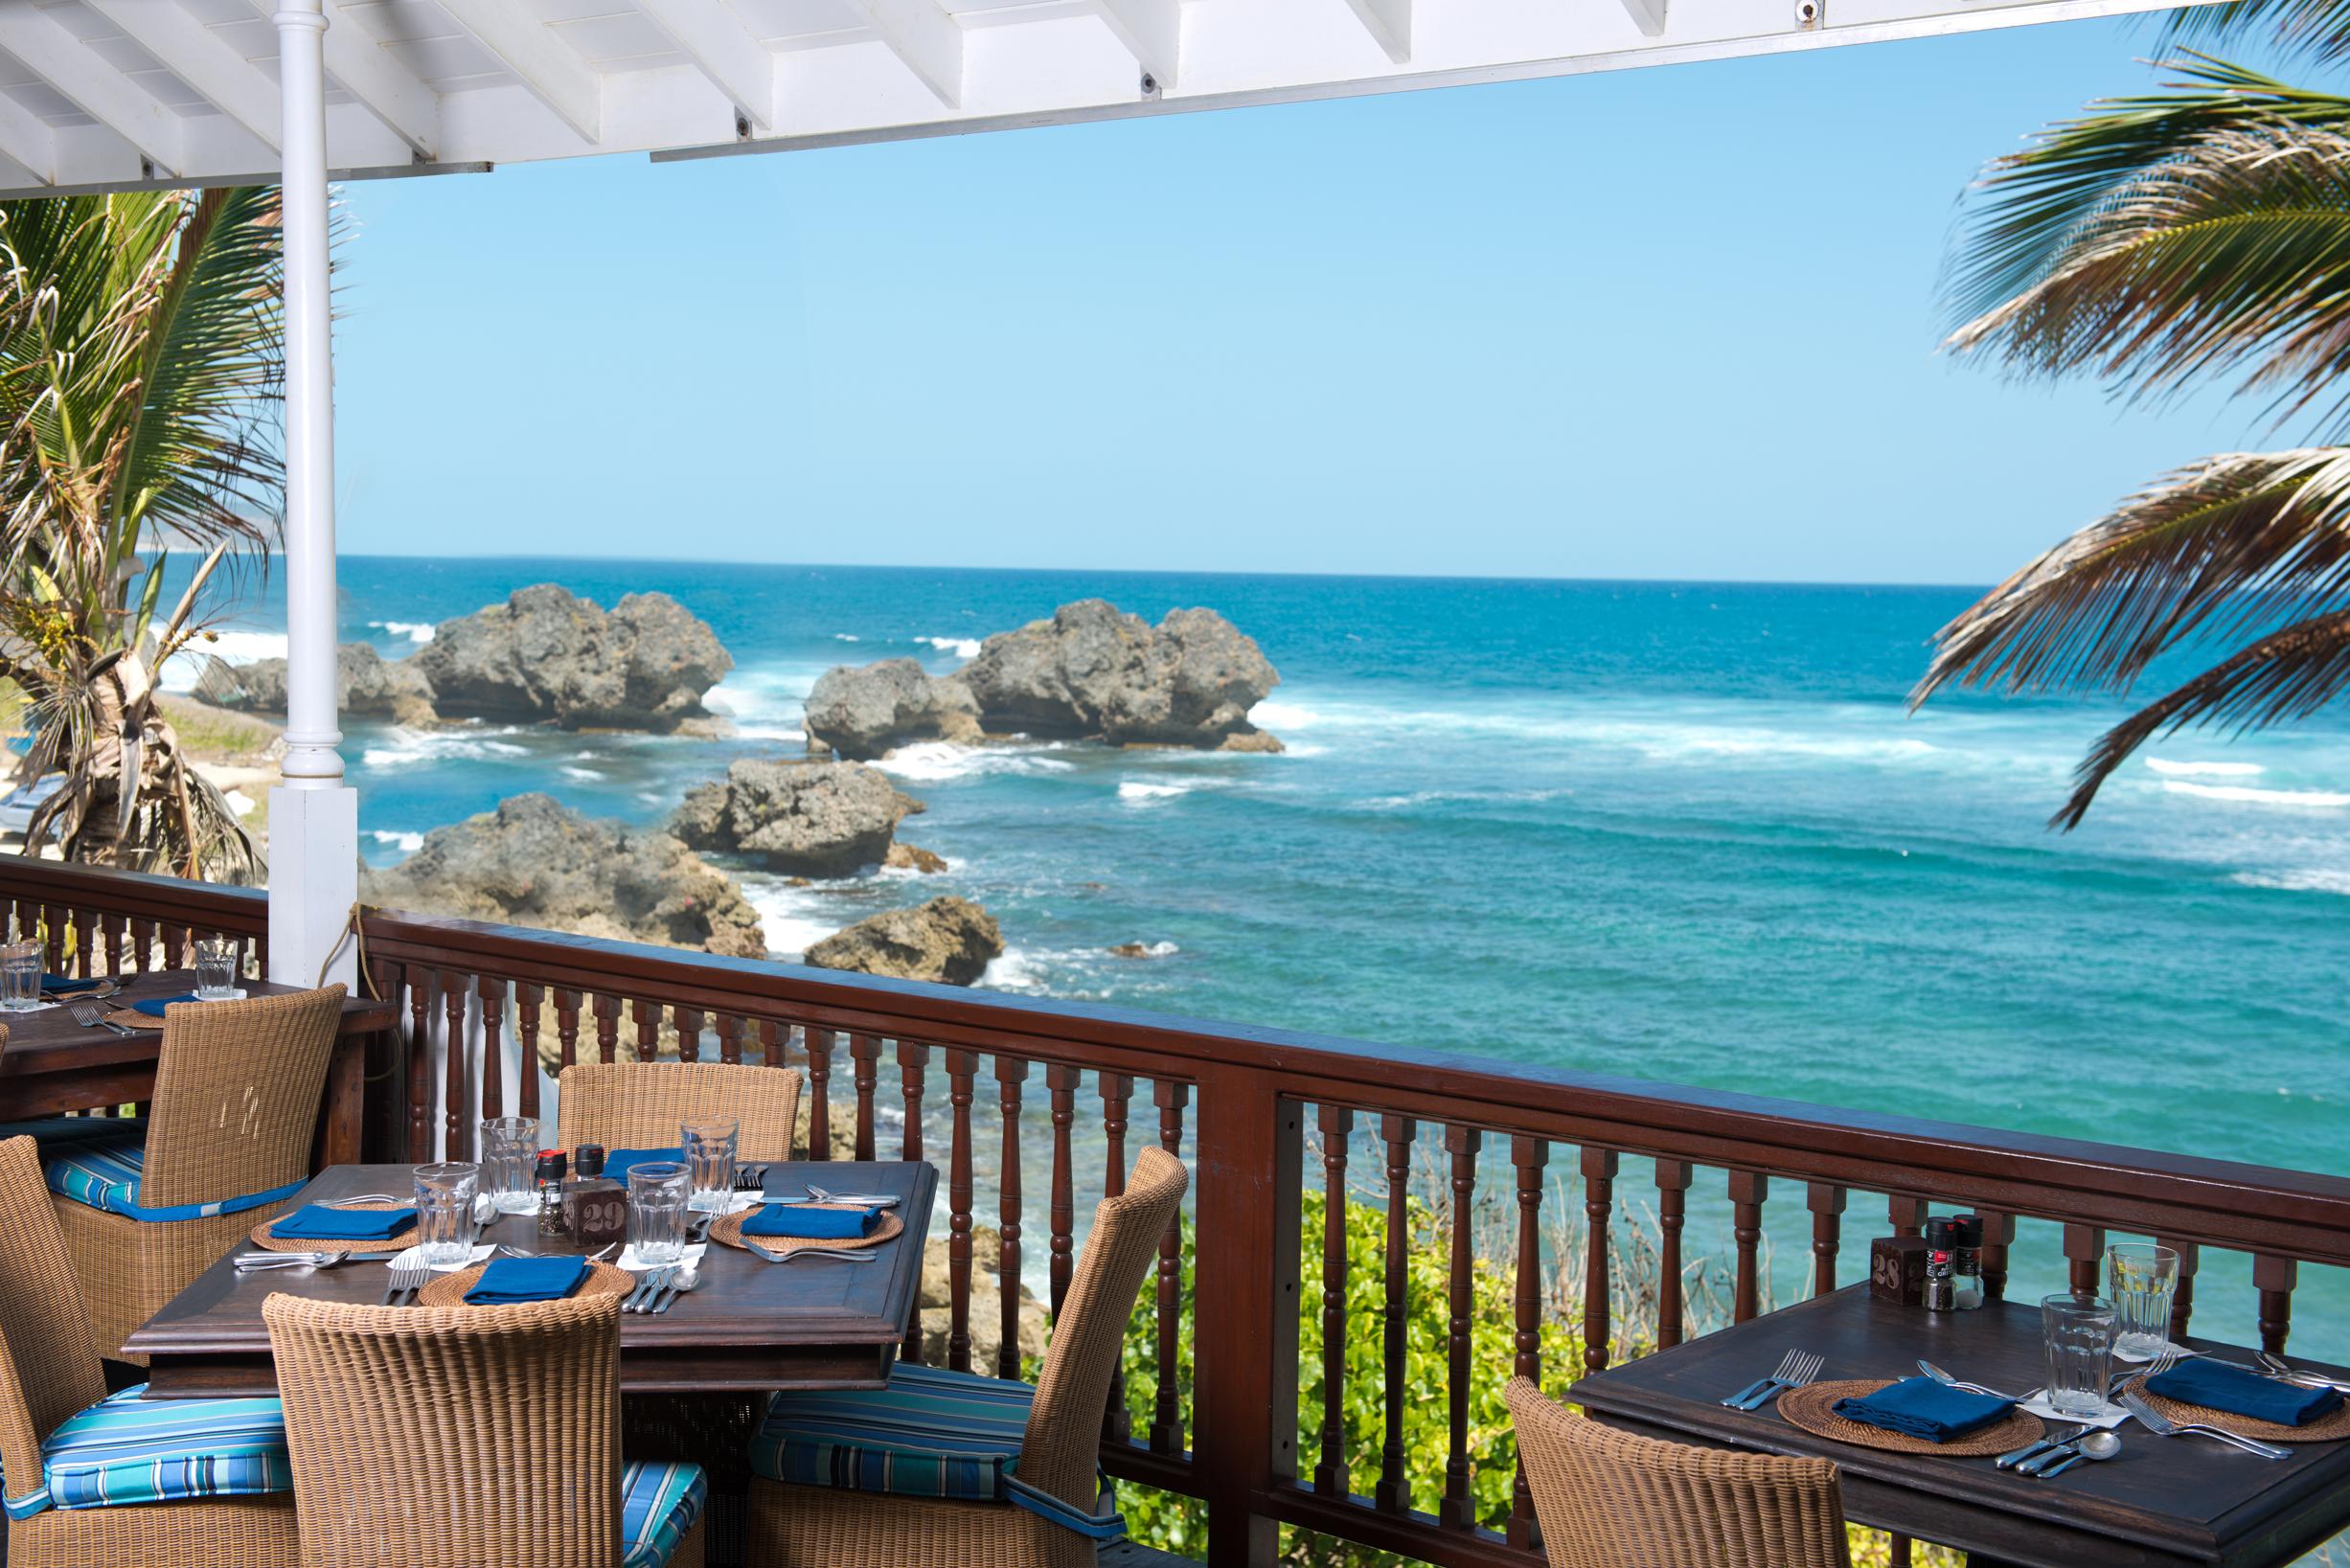 The Atlantis Hotel Barbados Hotels Caribbean Small